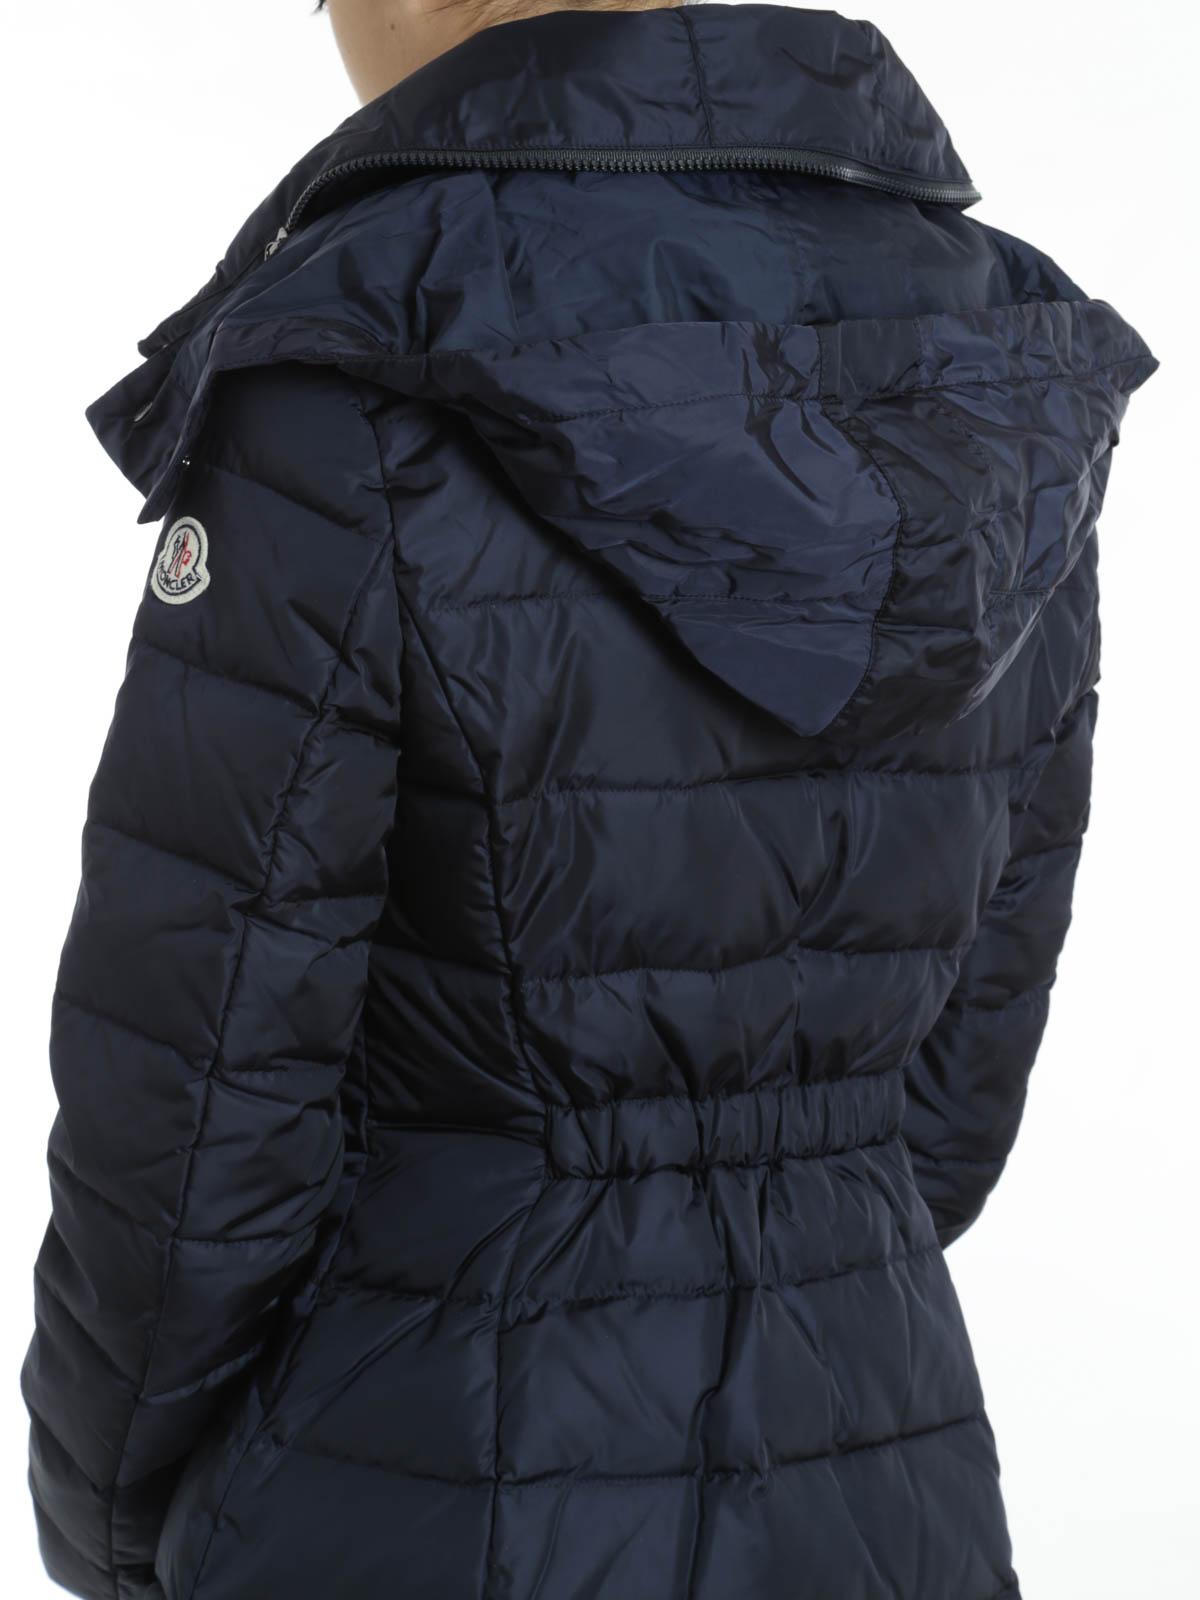 55c49528bf2a Moncler - Flammette down coat - padded coats - B2 093 4993105 54155 778